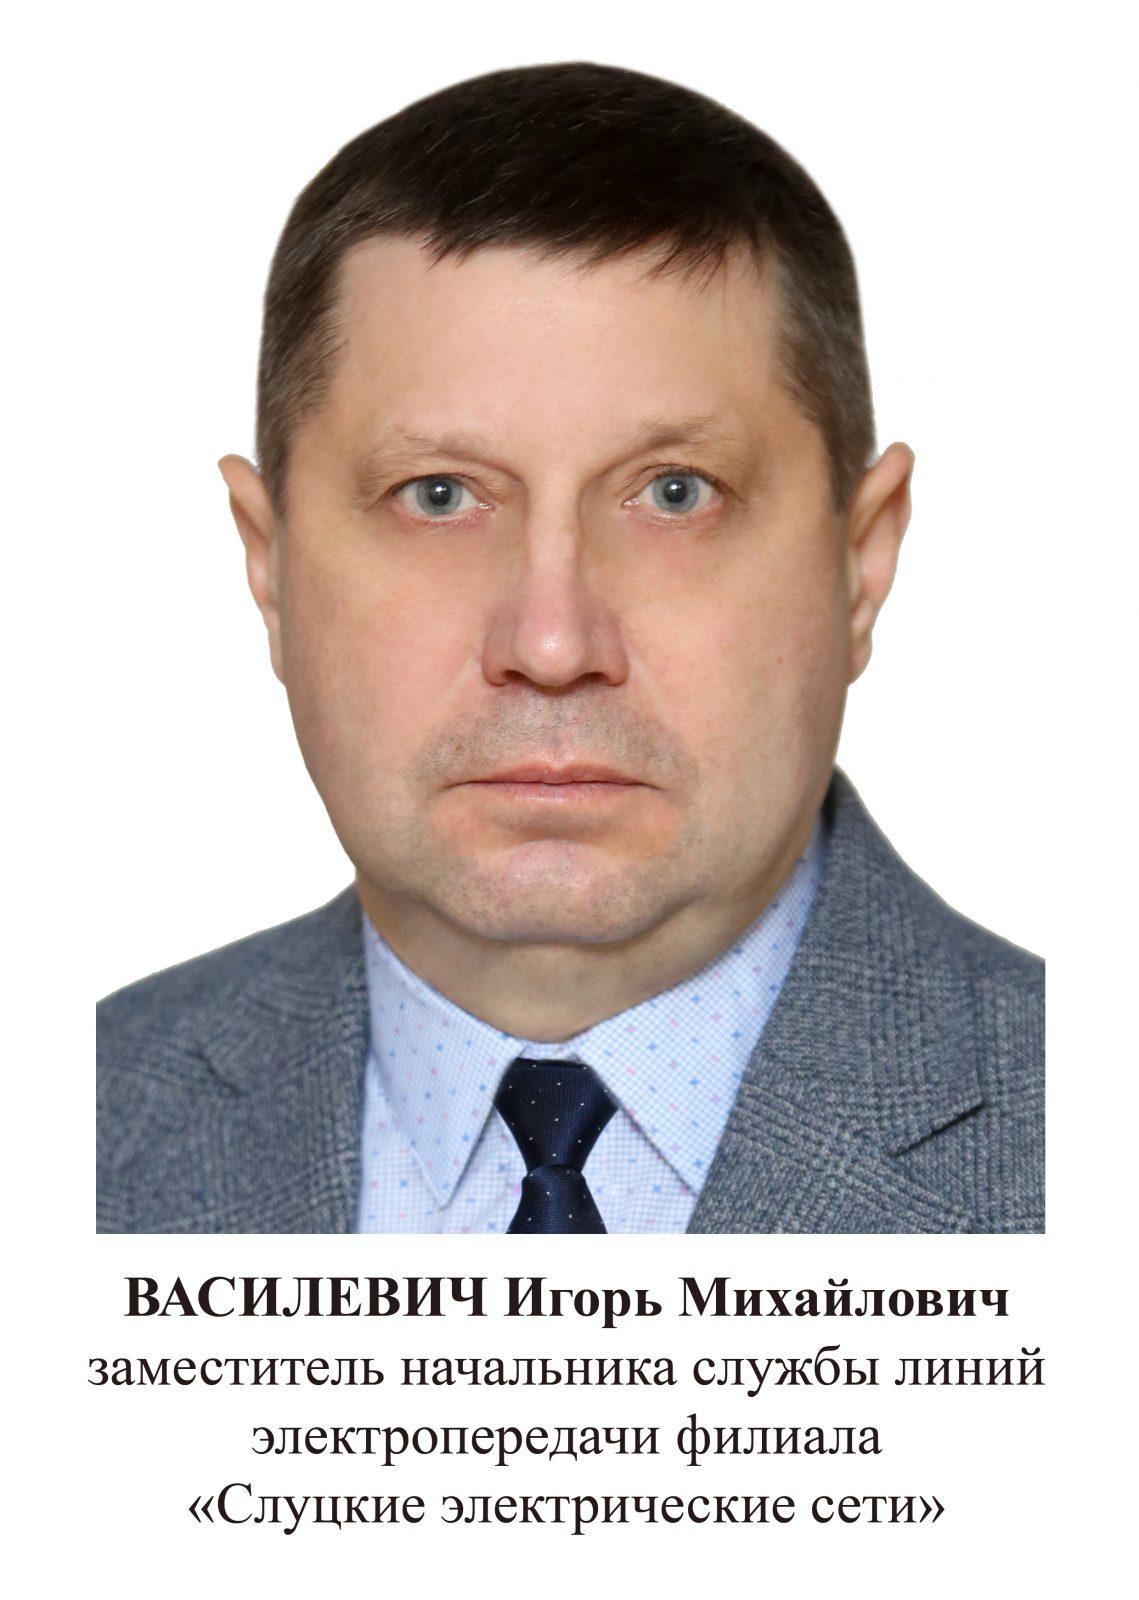 Василевич Игорь Михайлович